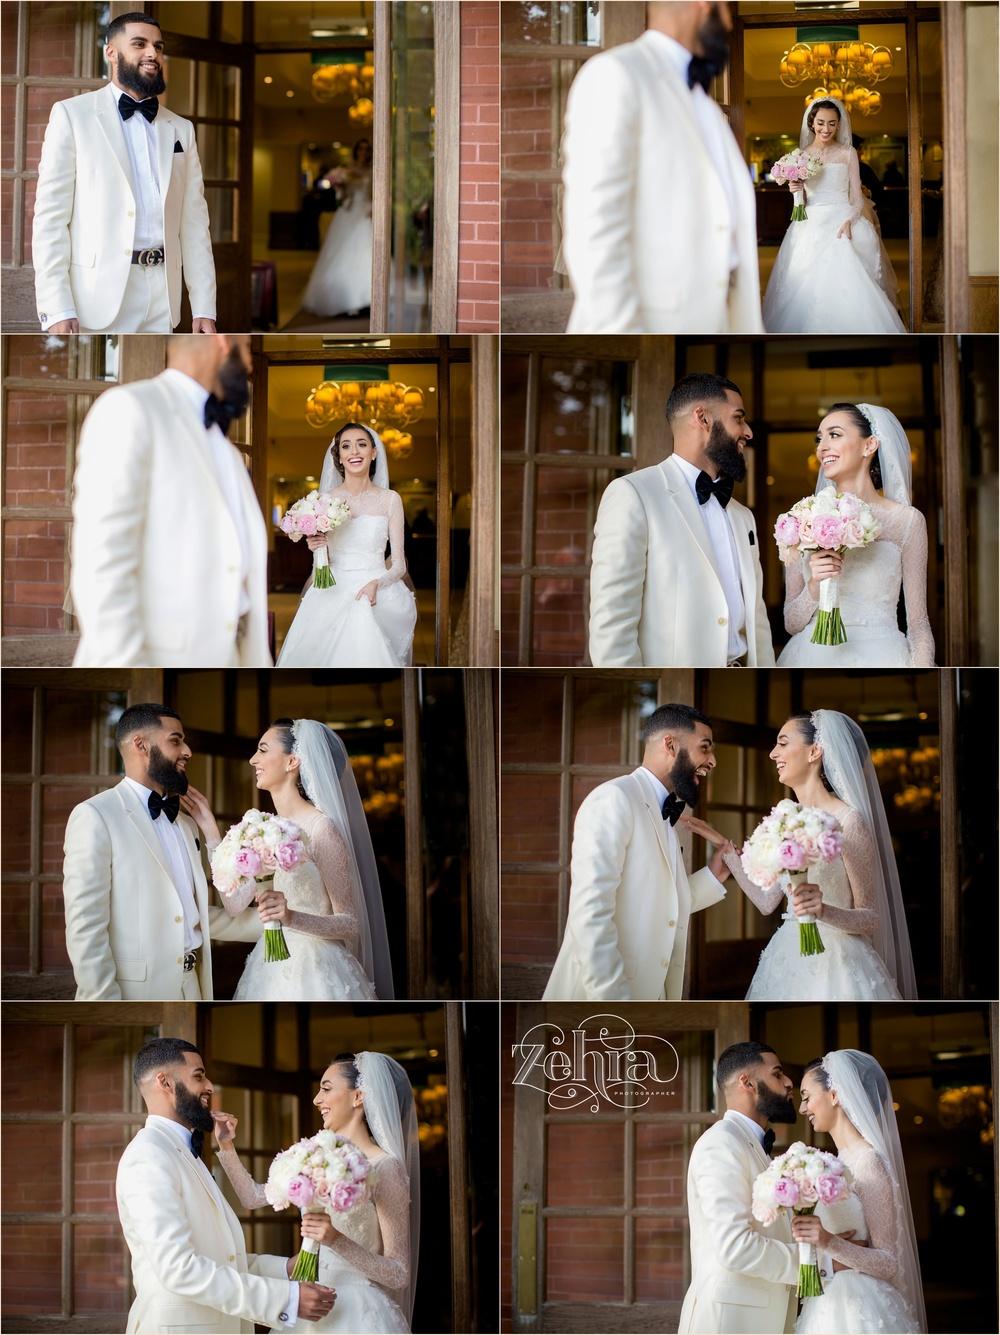 jasira manchester wedding photographer_0022.jpg